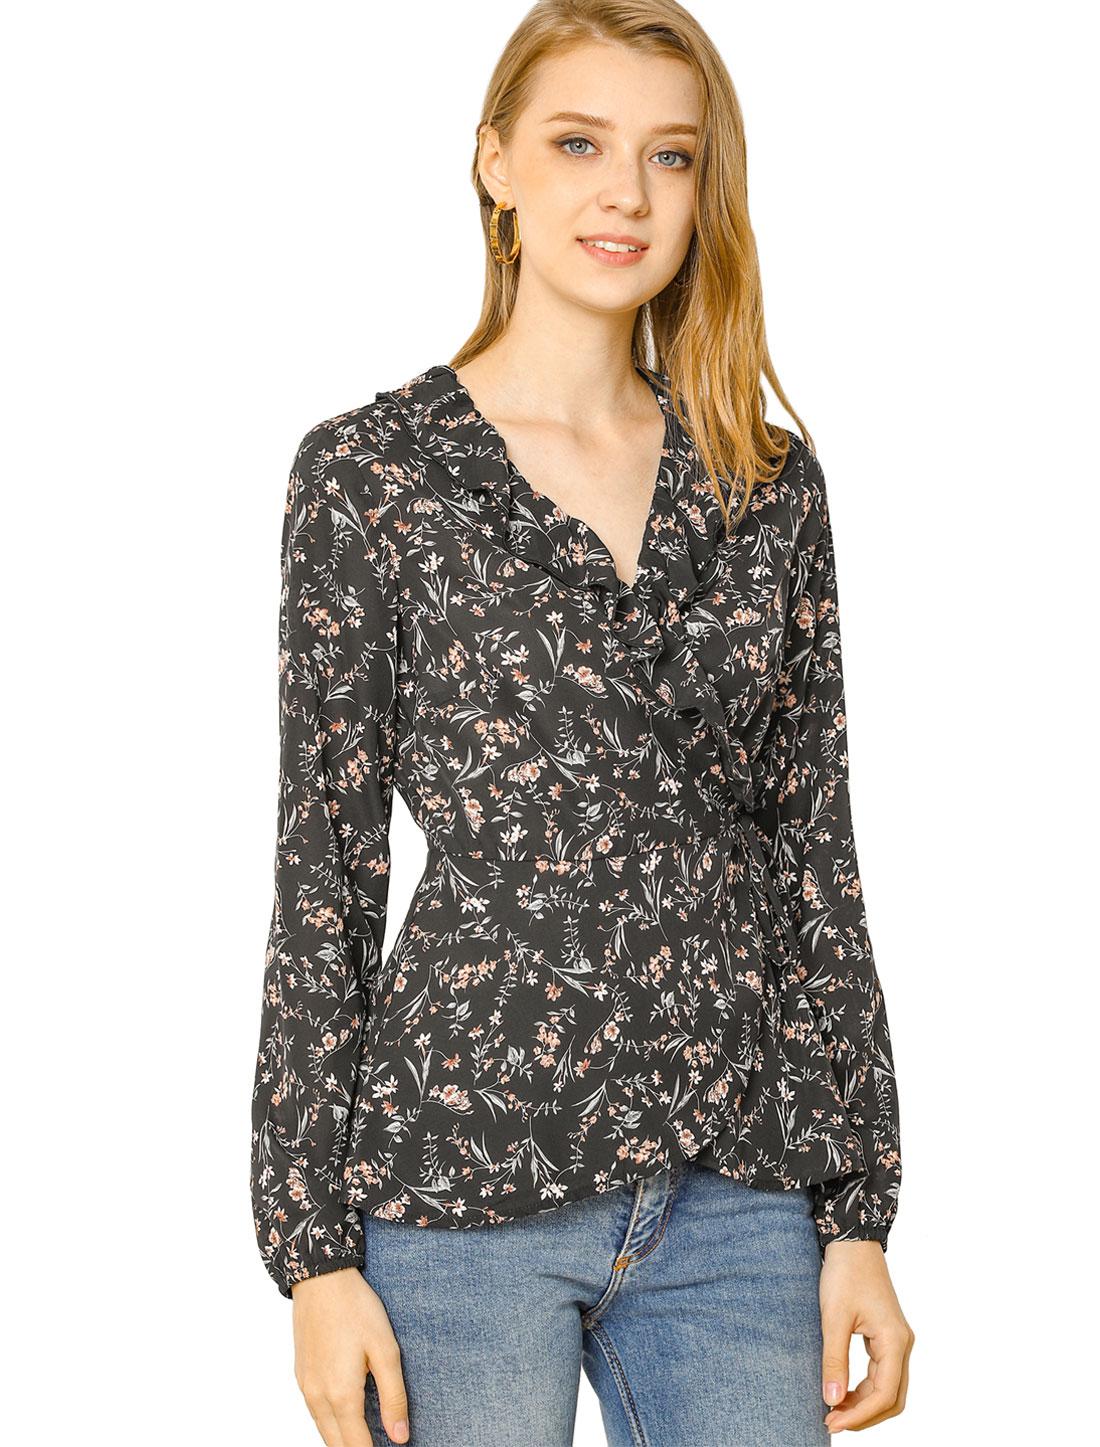 Women's Floral Ruffle V Neck Self Tie Wrap Peplum Top Black XL